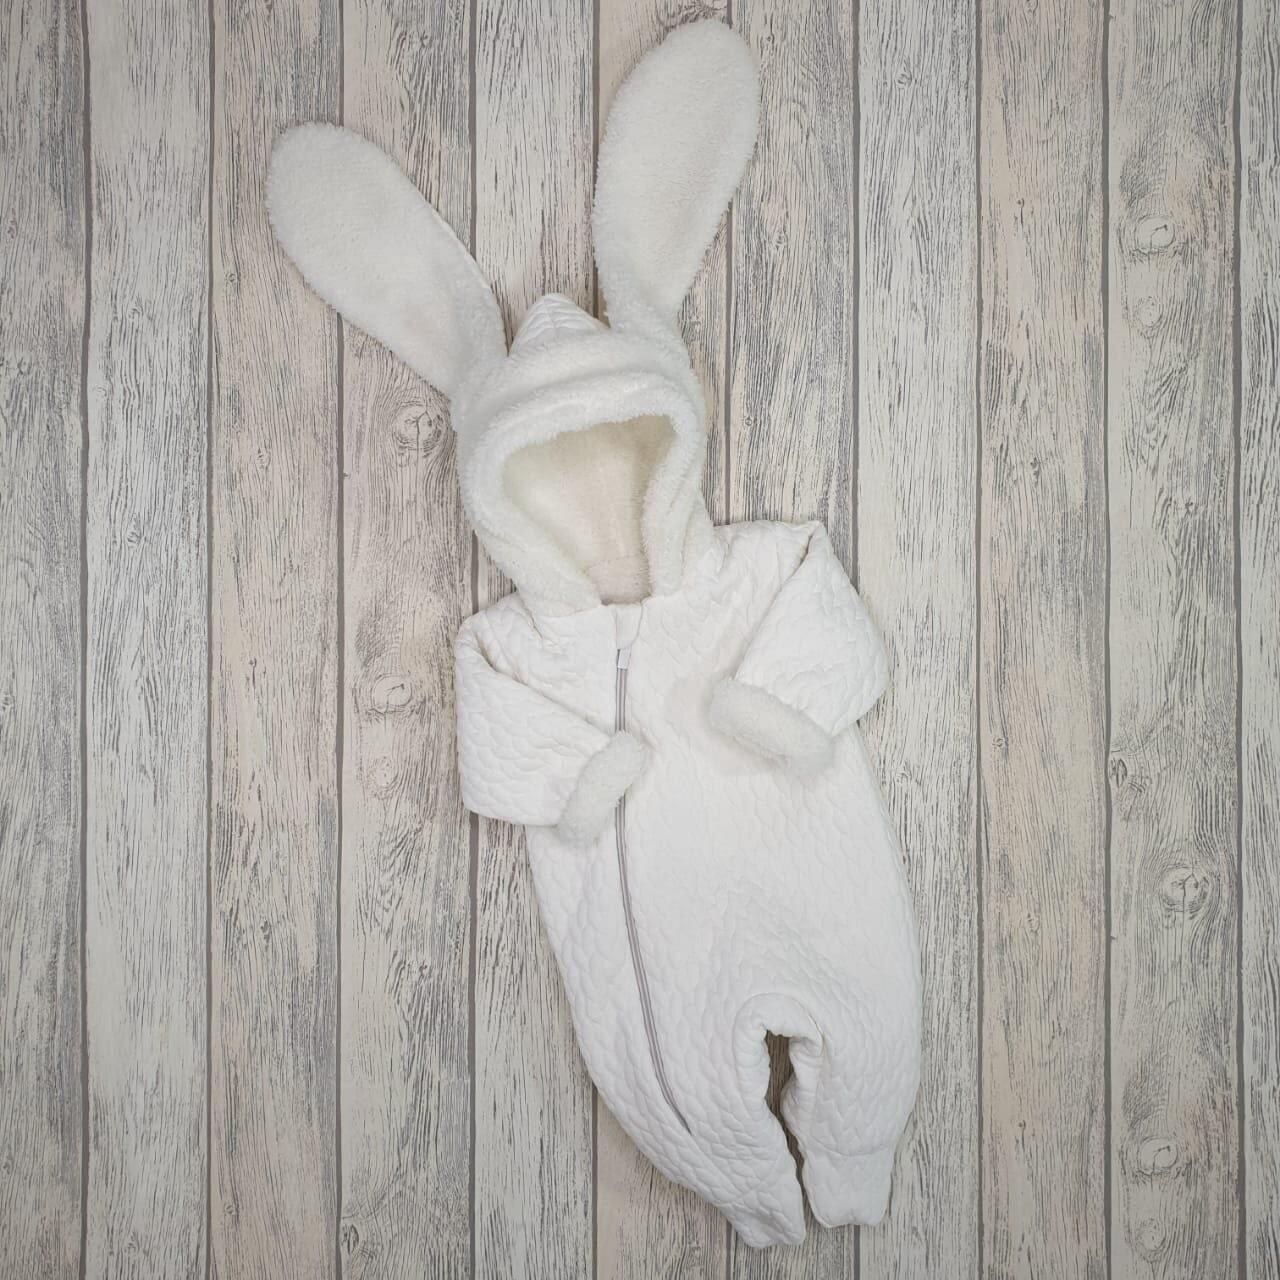 Комбинезон на молнии «Кролик», молочно-бежевый